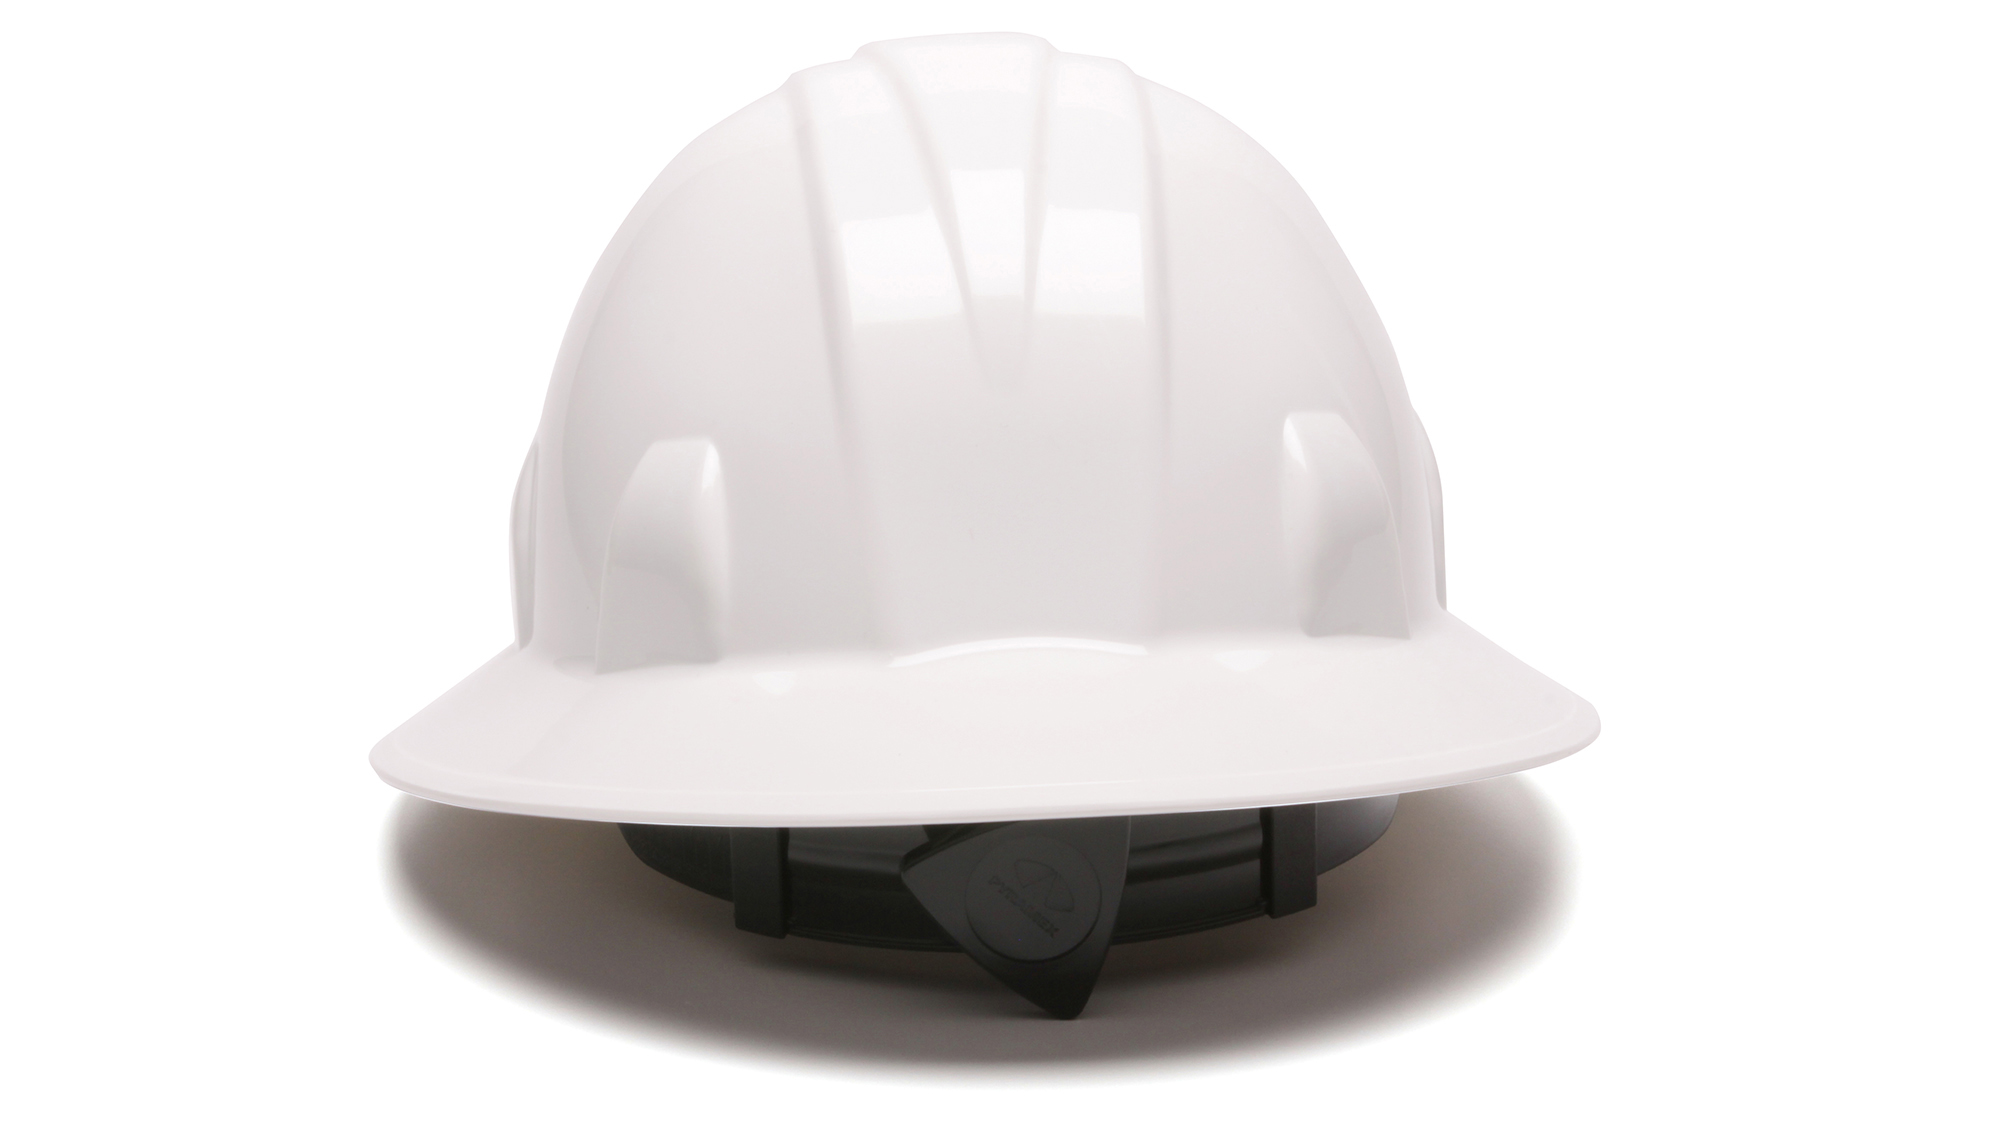 Pyramex Full Brim Hard Hat - With 4 Point Ratchet Suspension